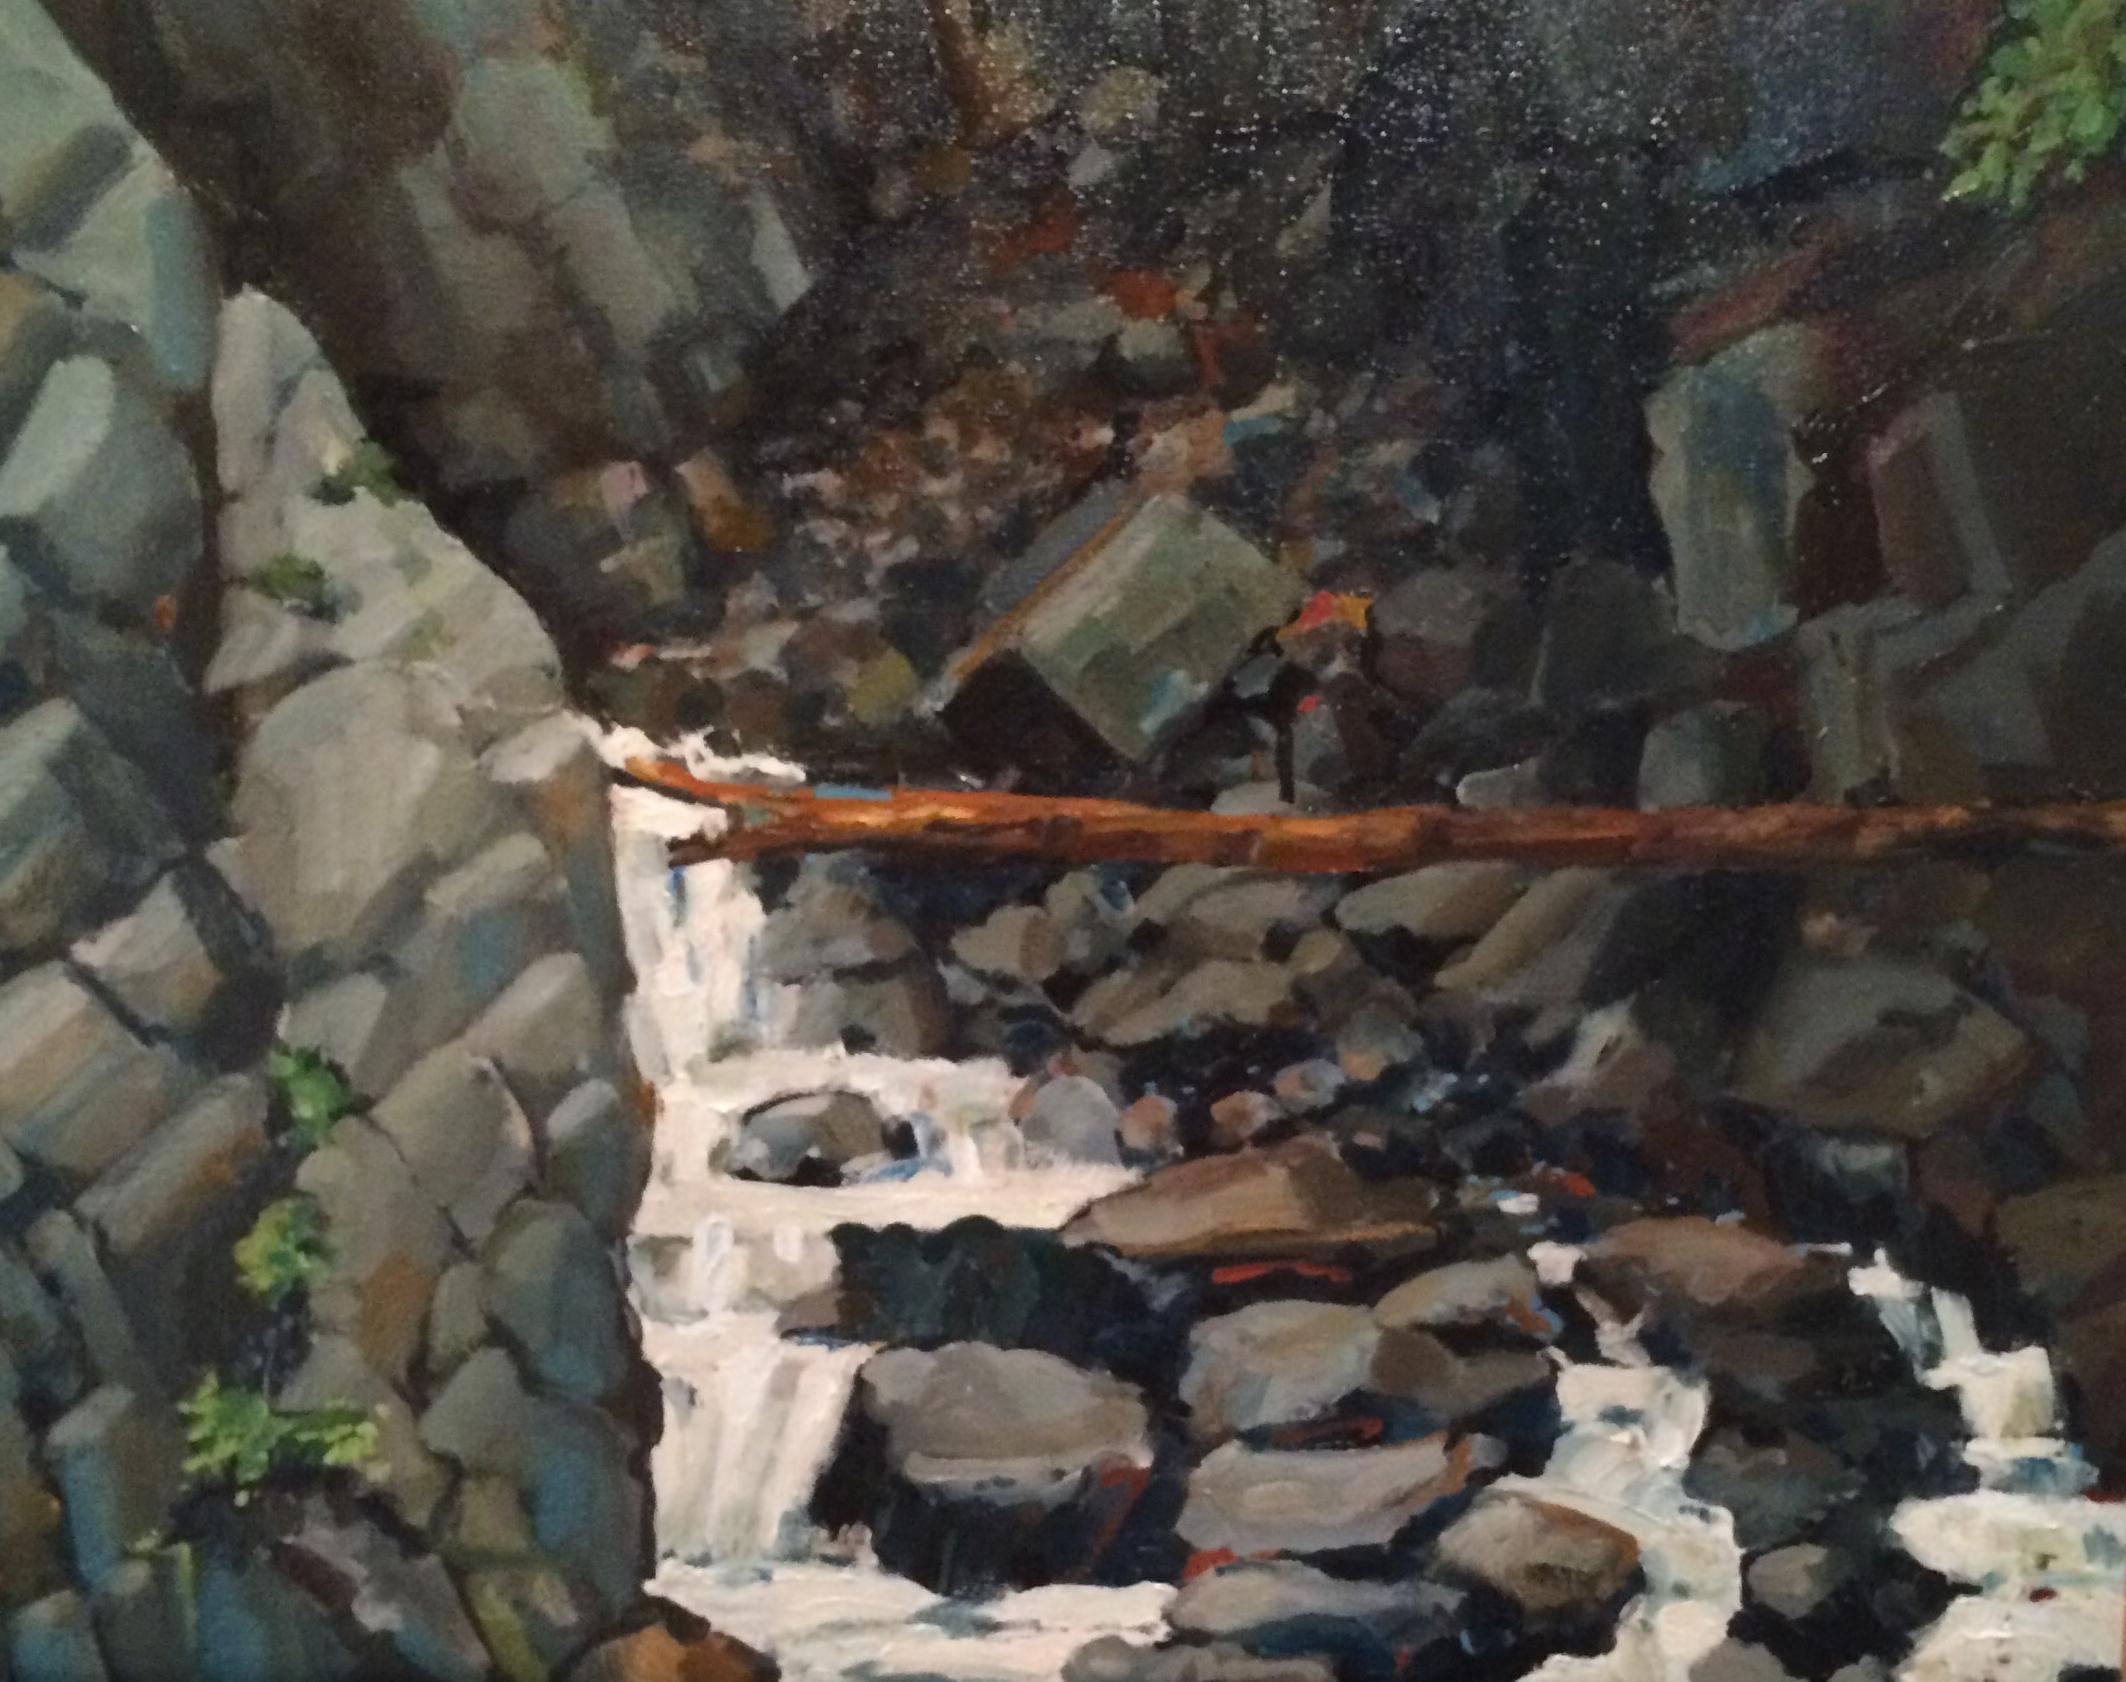 Roaring Brook Falls: 2014